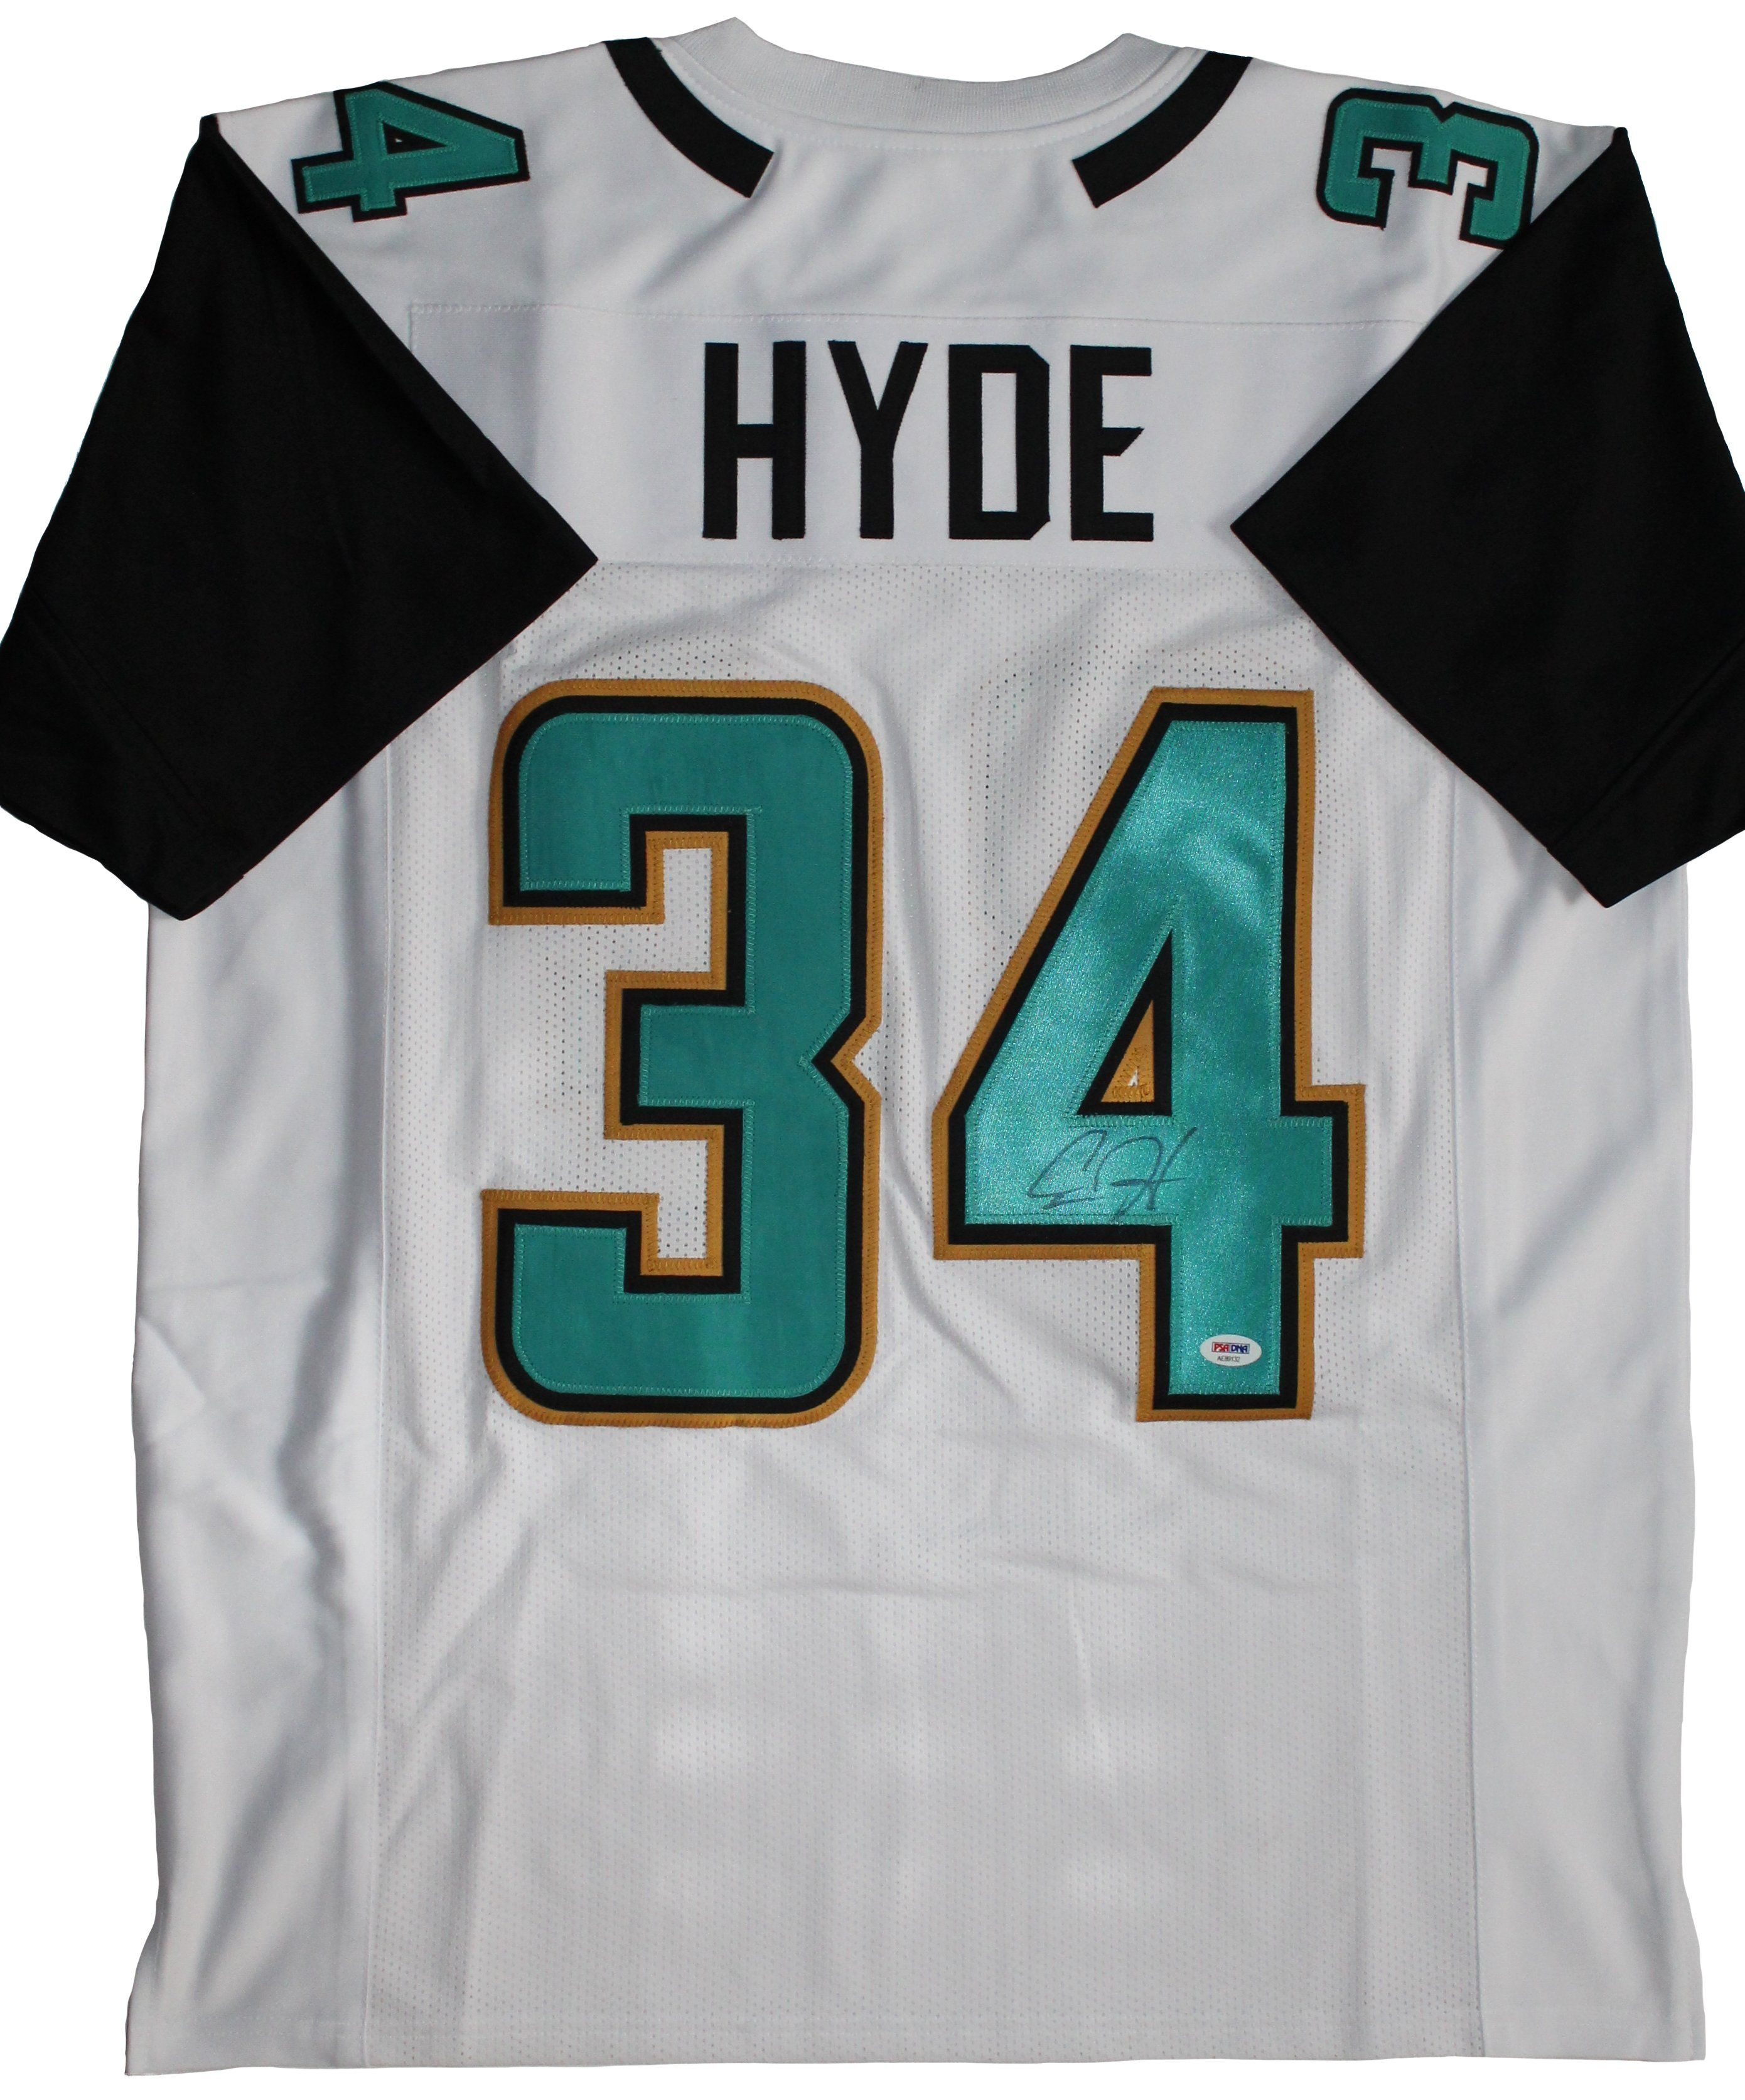 buy popular 66849 1de19 Carlos Hyde Signed Jacksonville Jaguars Jersey in 2019 ...